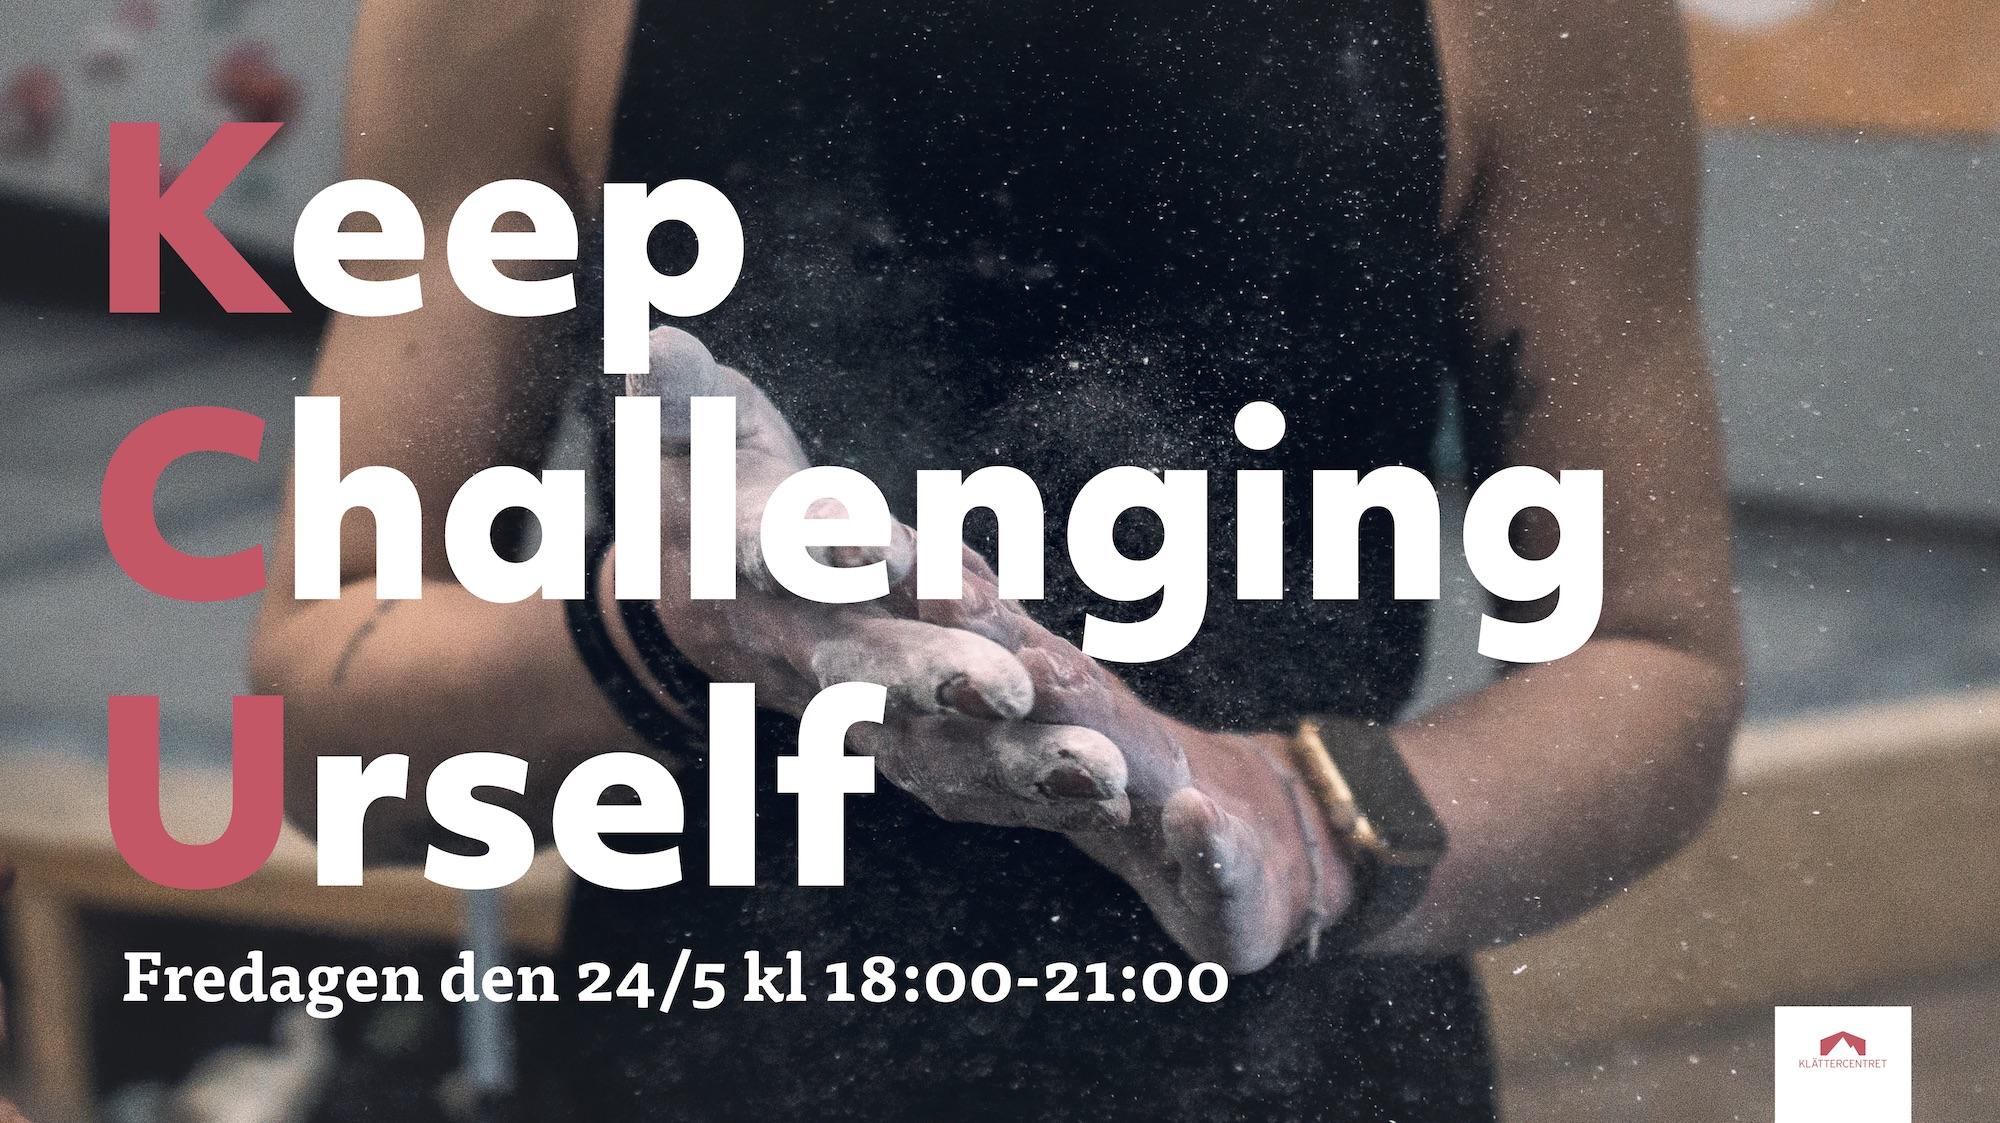 Keep Challenging Urself – Nytt event!